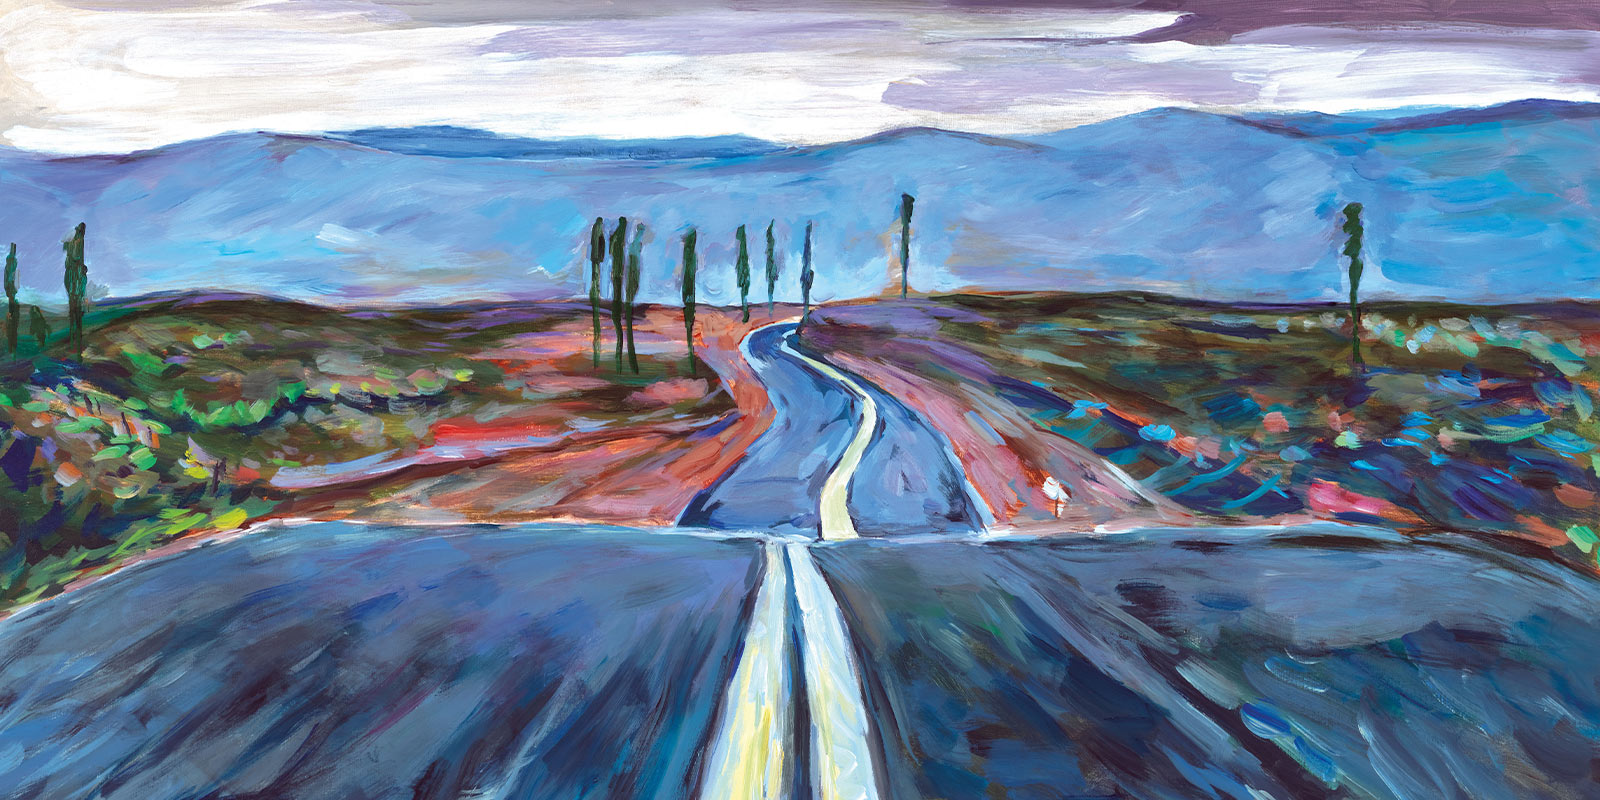 Bob Dylan Endless Highway Artwork - Premium Modern Art - Musiker, Maler & Zeichner